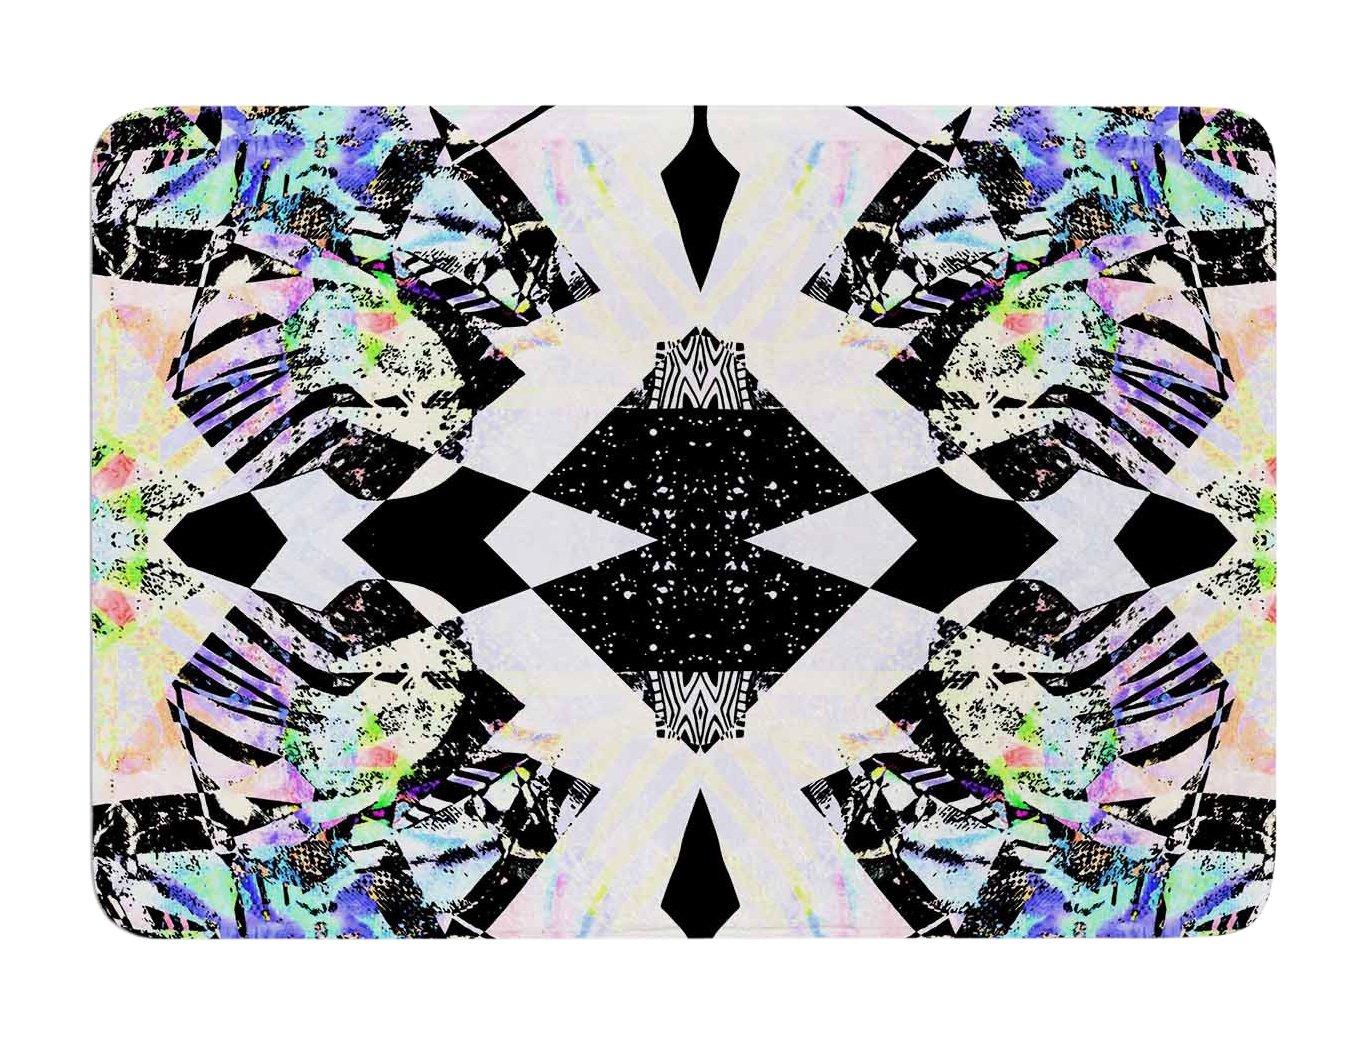 Kess InHouse Vasare NAR Abstract Zebra Black Lavender Memory Foam Bath Mat, 17 by 24-Inch, 17' X 24'